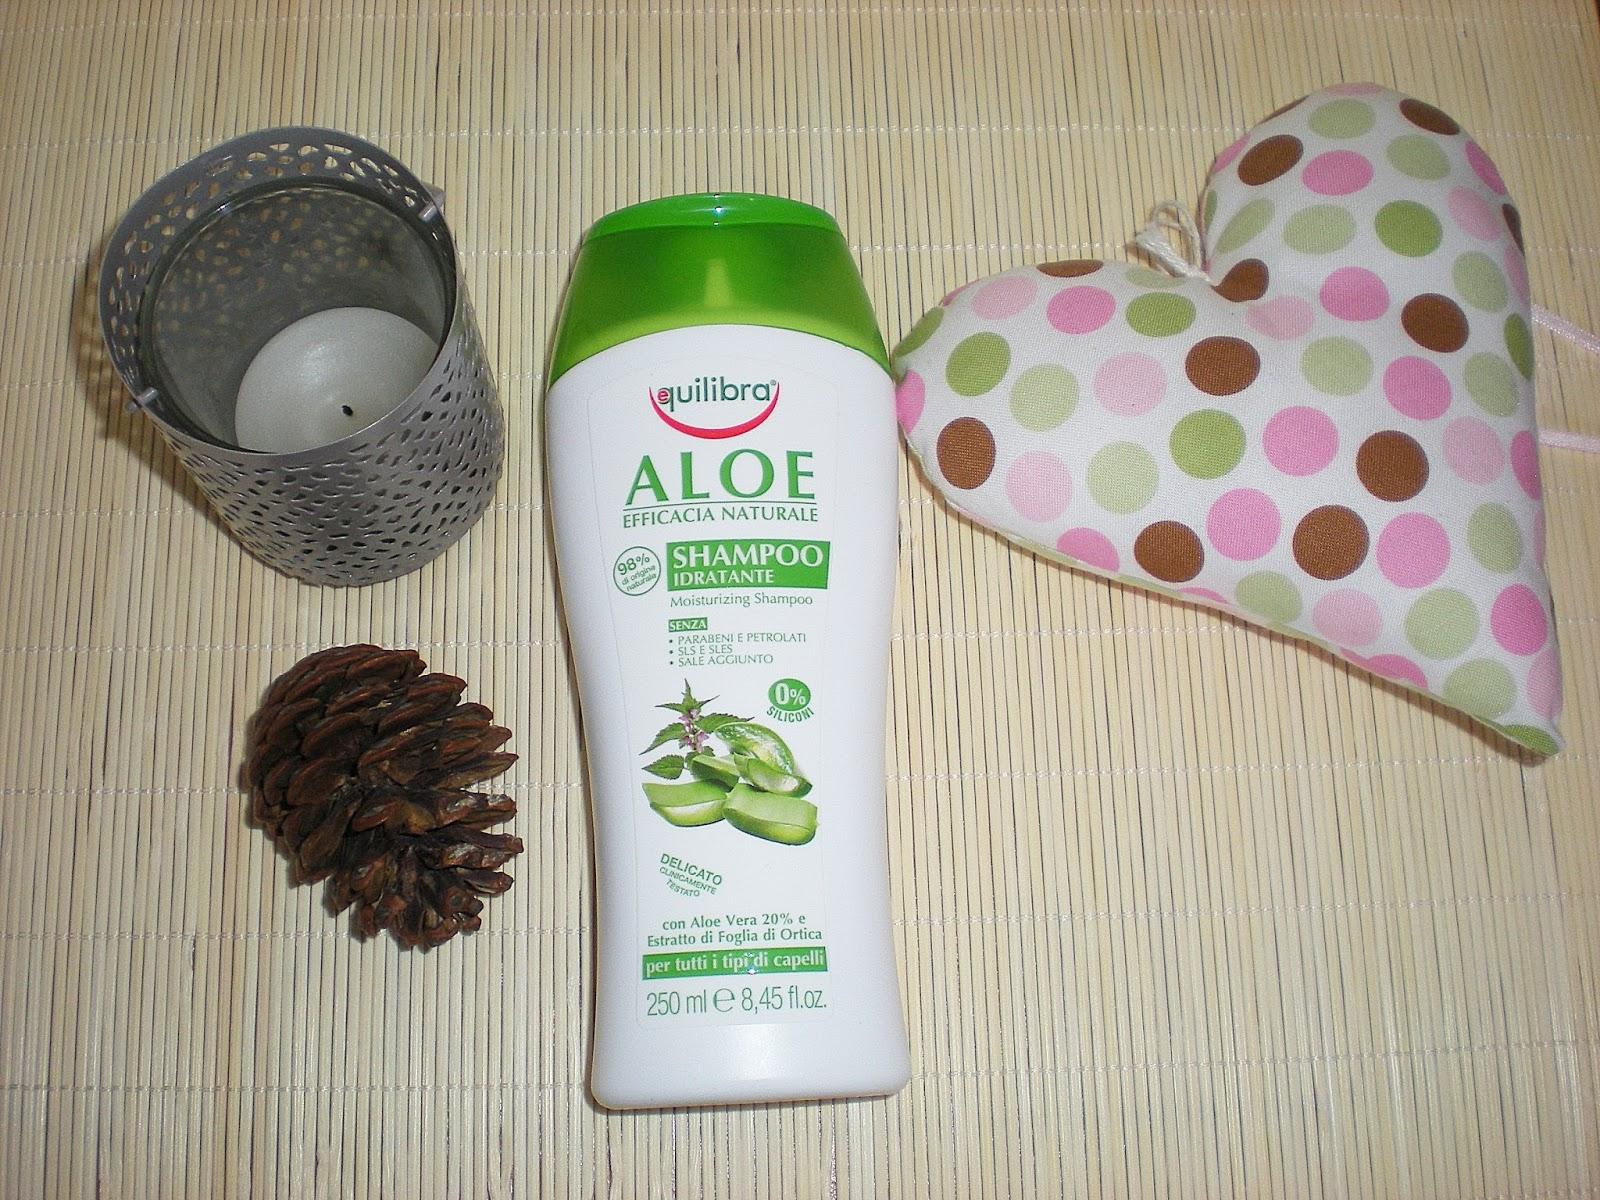 Aloesowy szampon_Equilibra